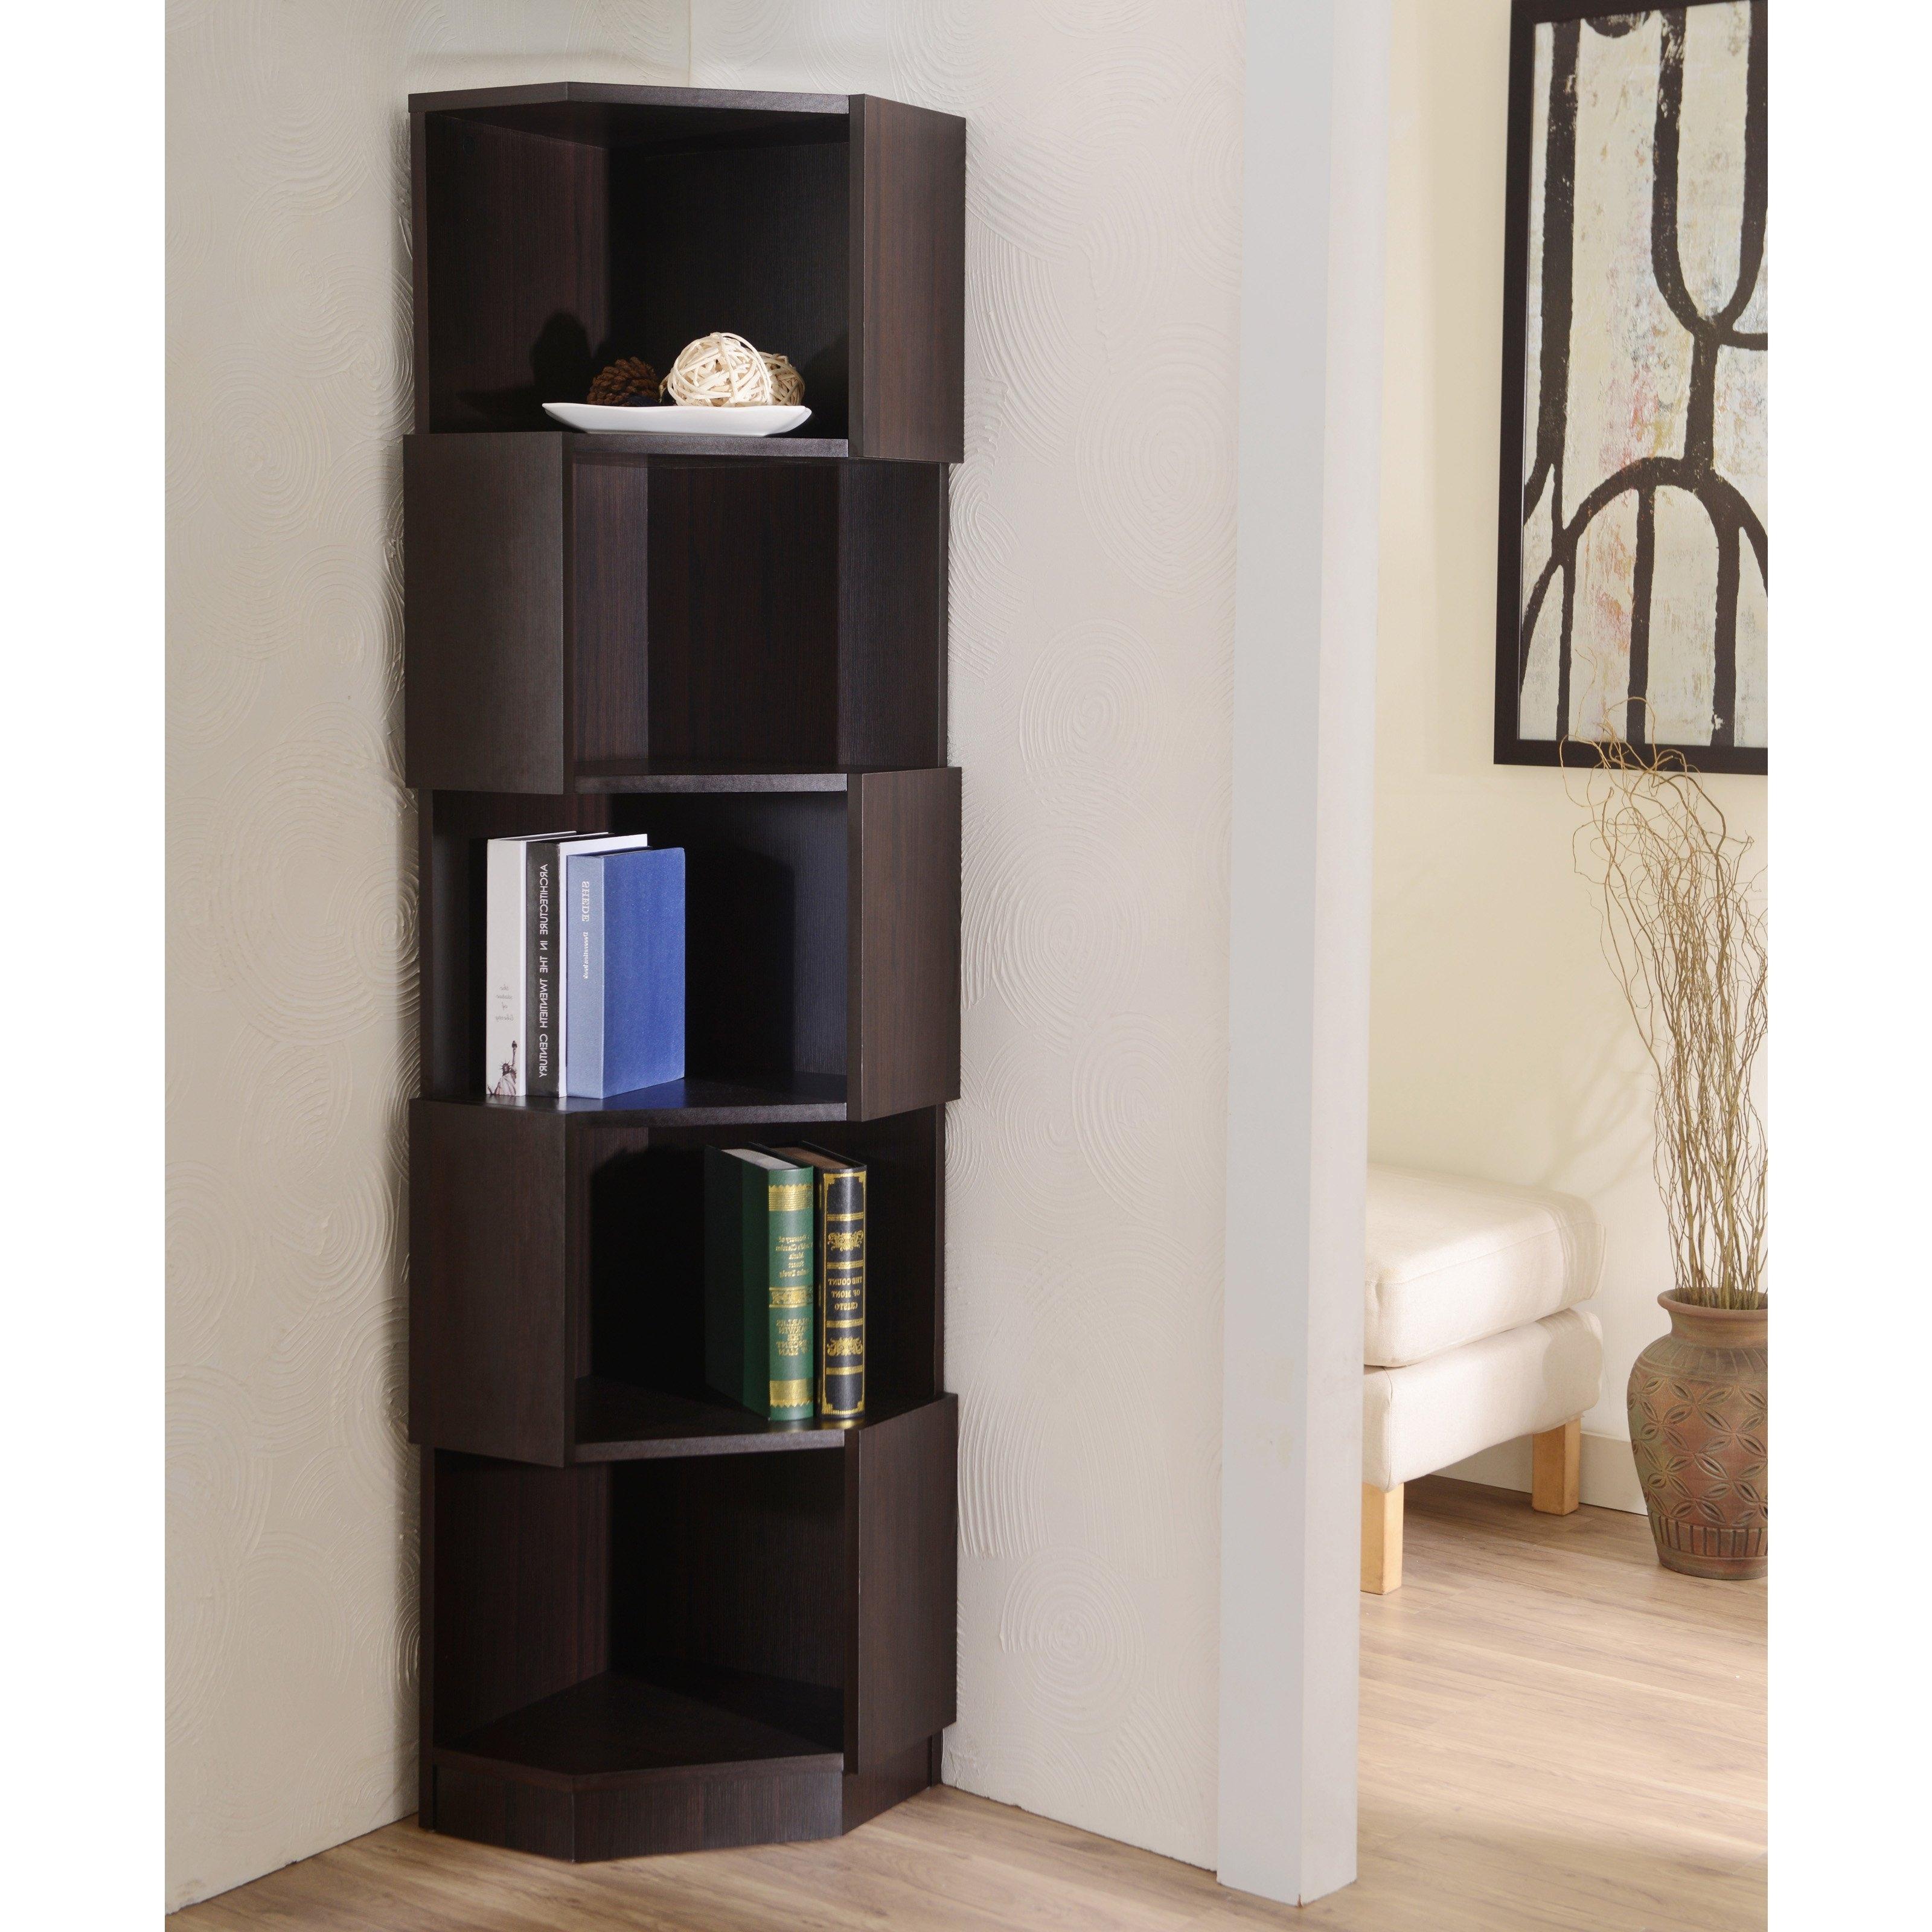 Corner Bookshelves Regarding Most Popular Corner Bookcases (View 7 of 15)